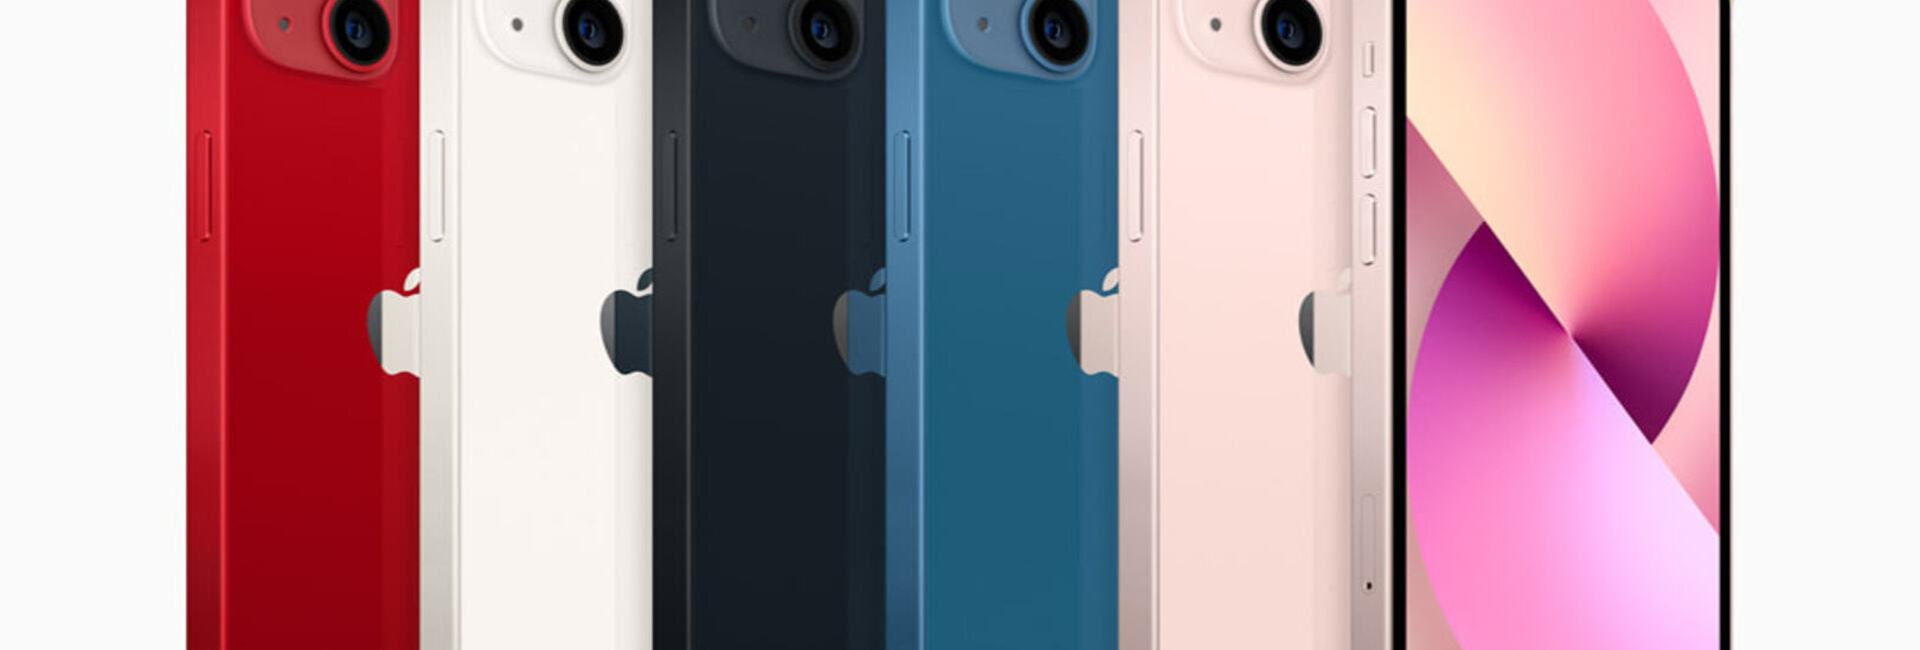 Apple_iphone13_colors_geo_09142021_big.jpg.large